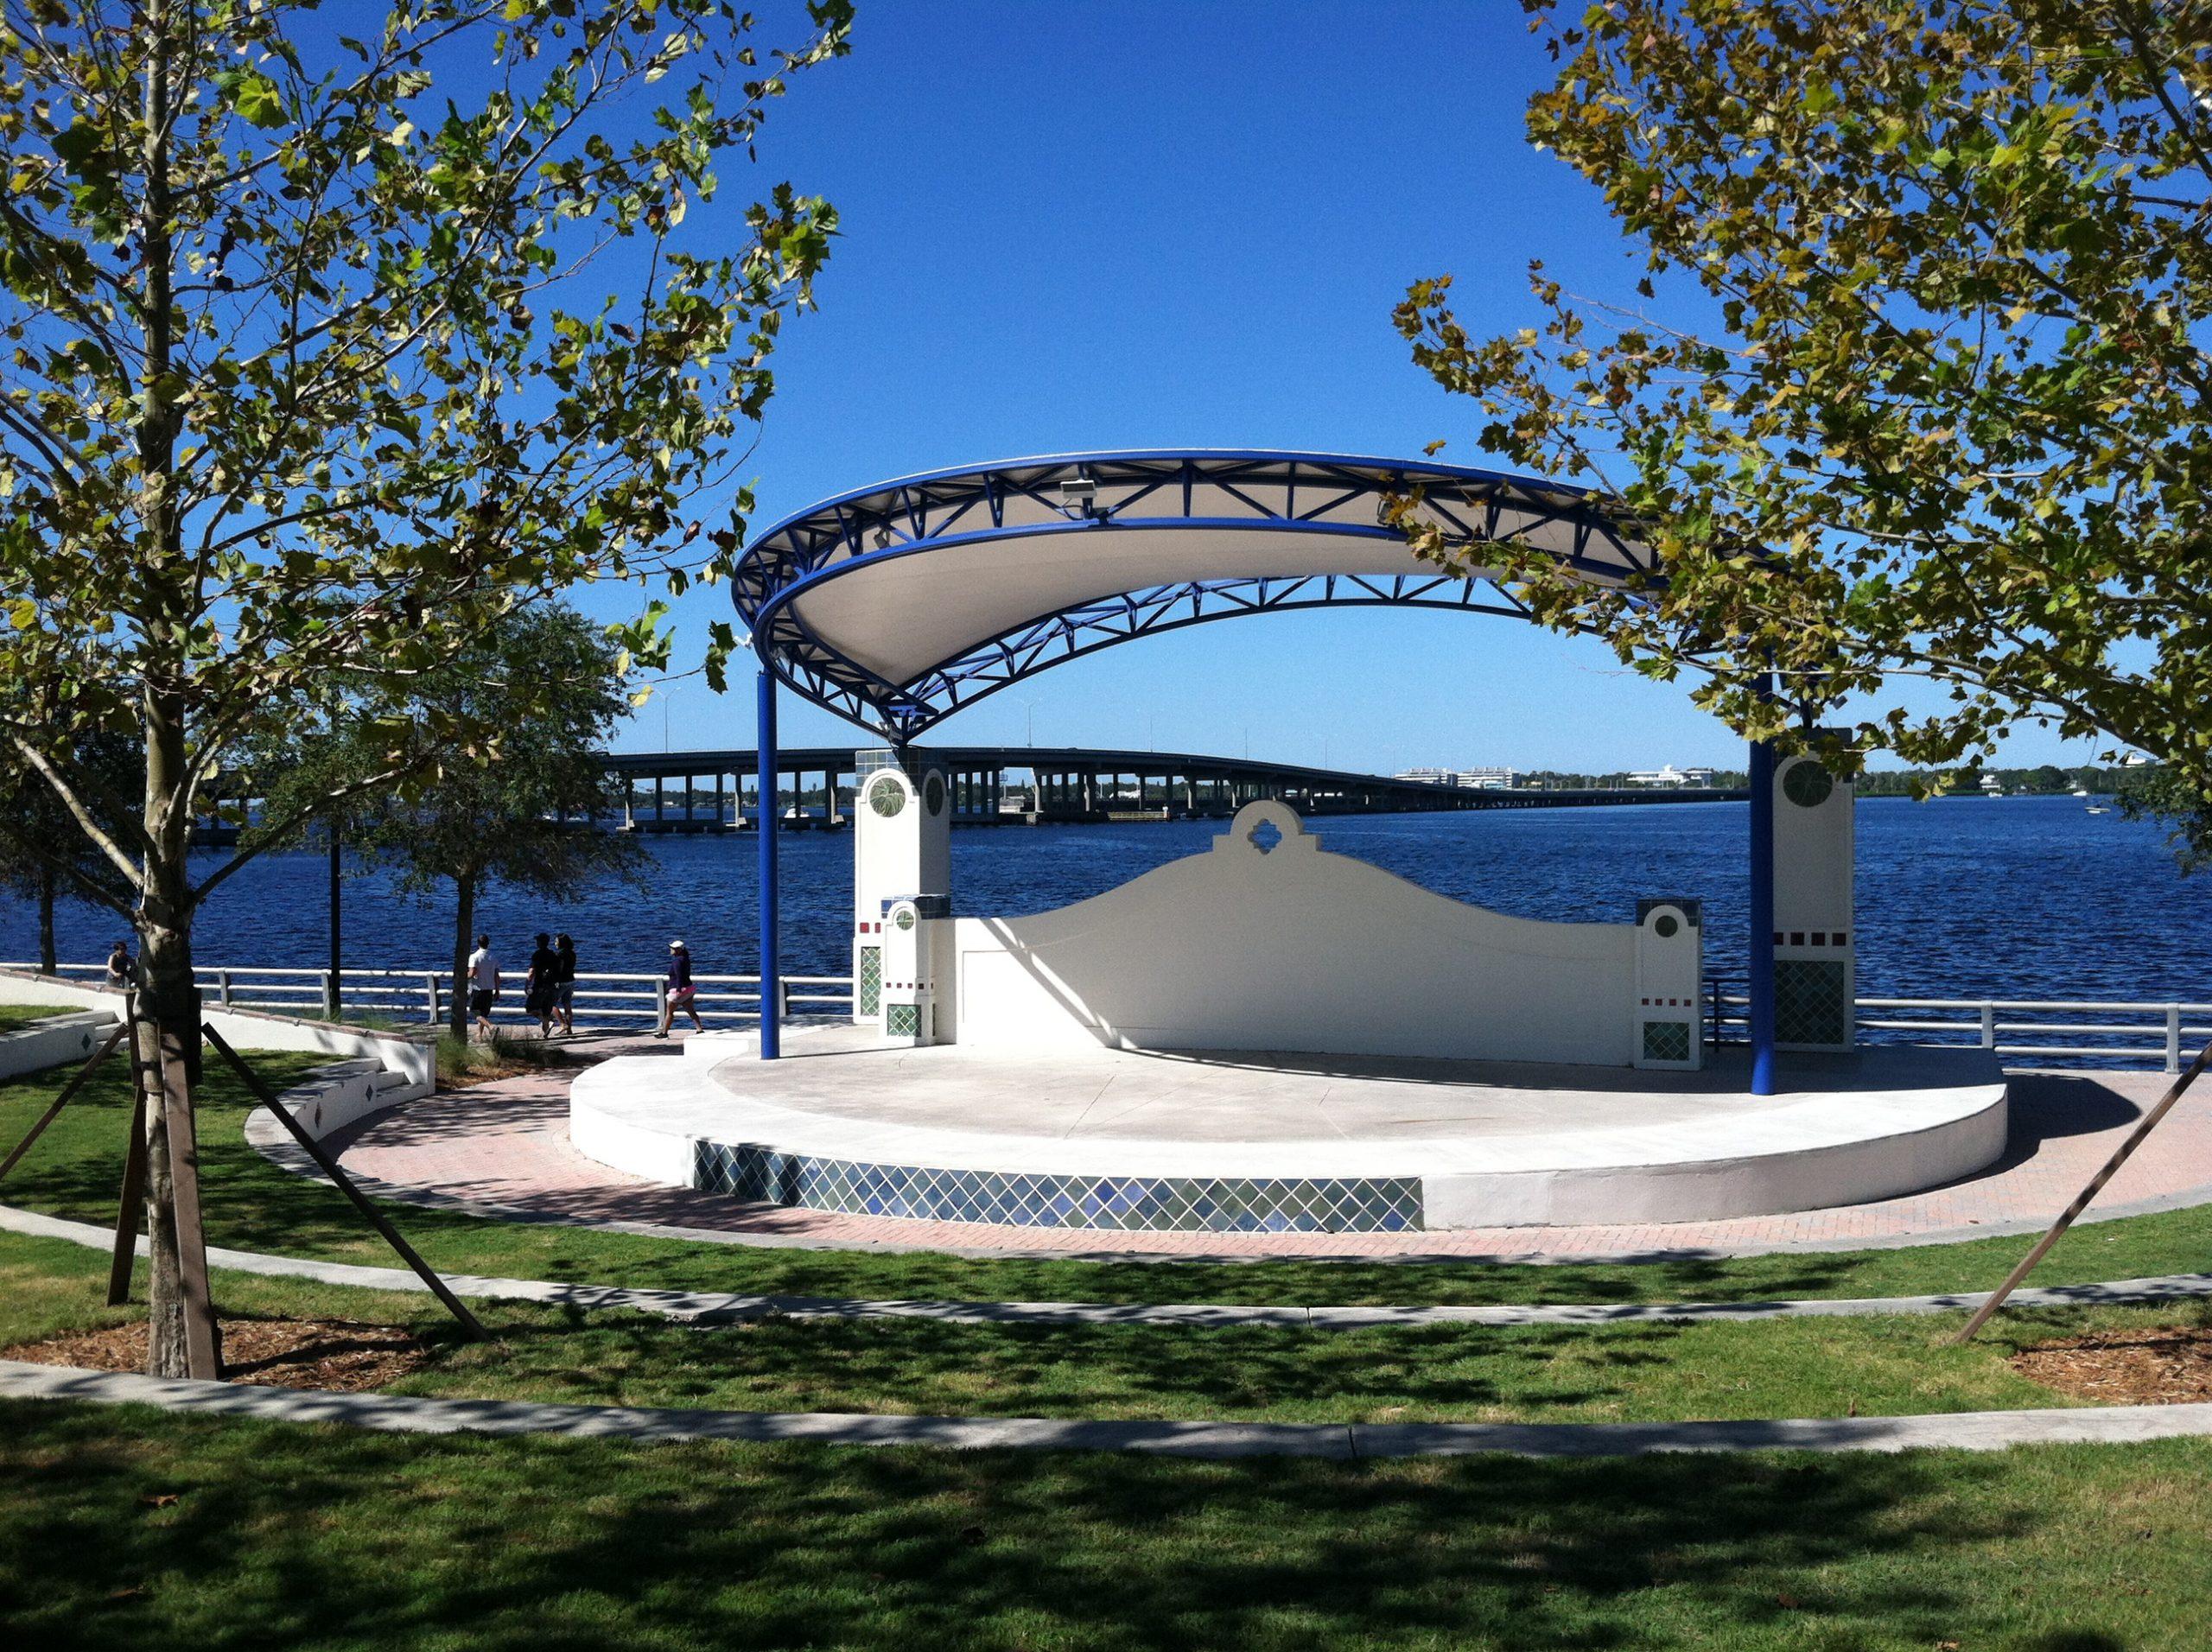 Bradenton Riverwalk Park Amphitheater